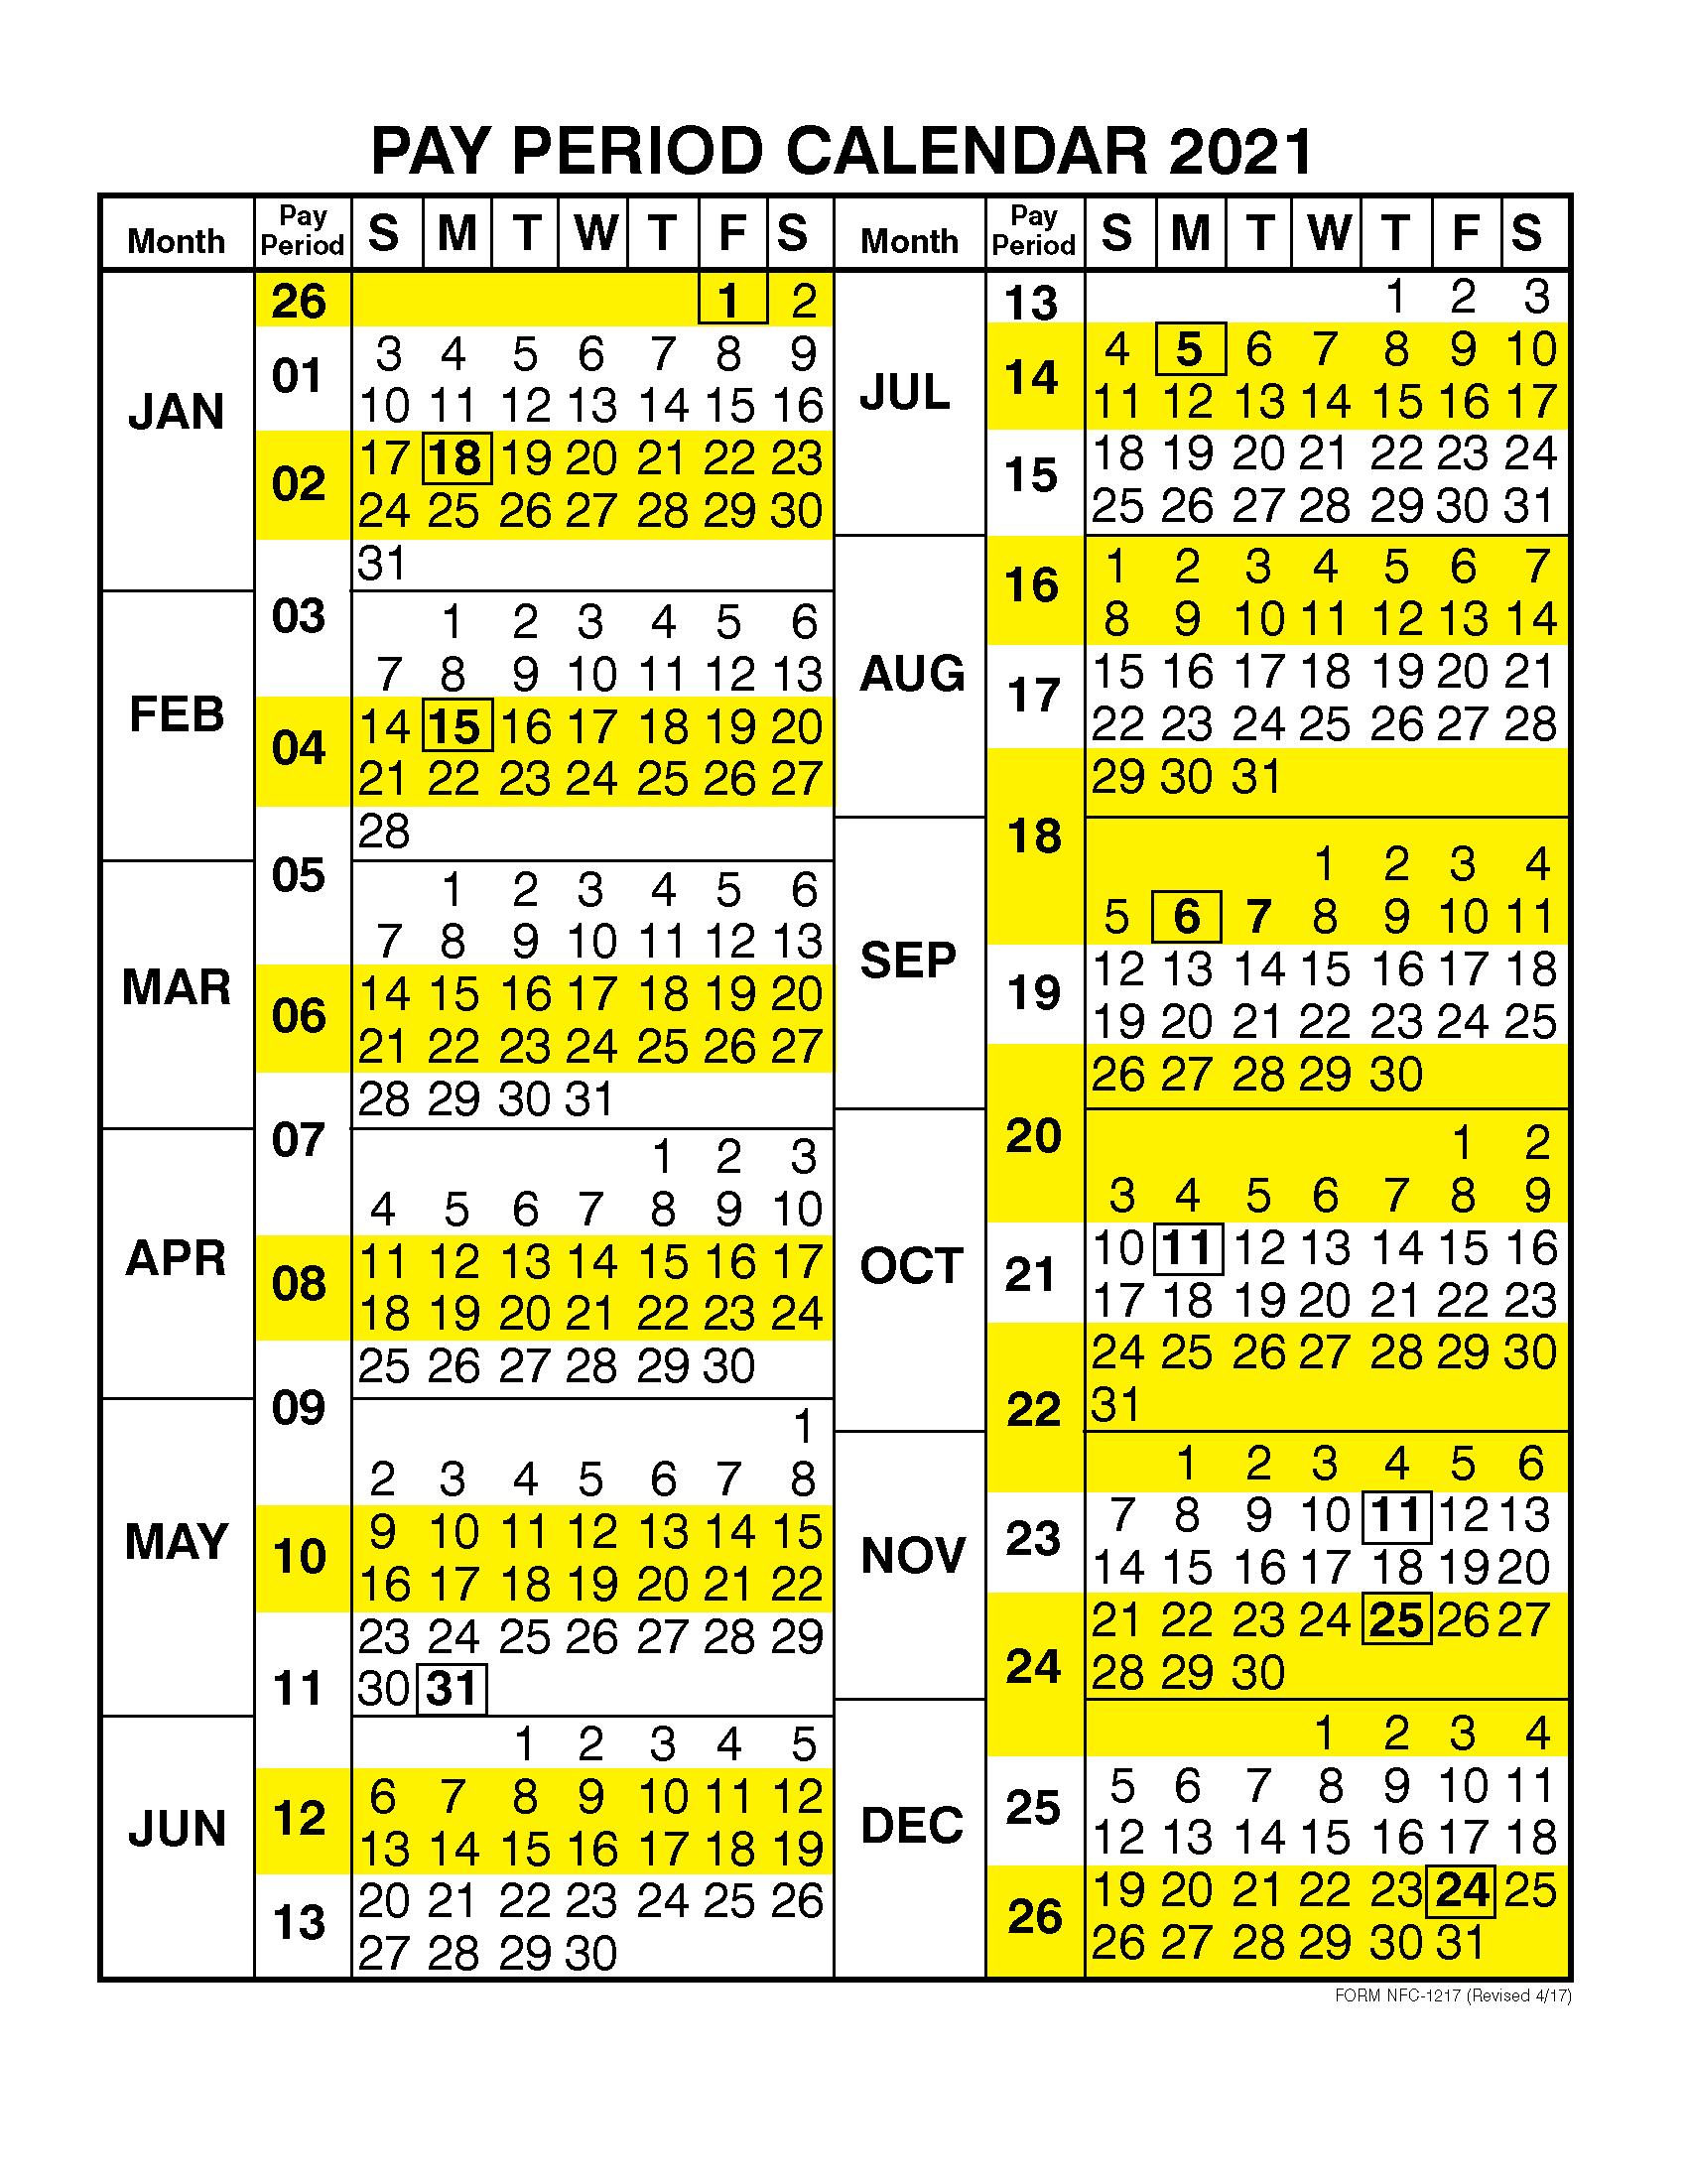 Pay Period Calendar 2021Calendar Year | Free Printable Regarding 2015 Pay Period Calendar Federal